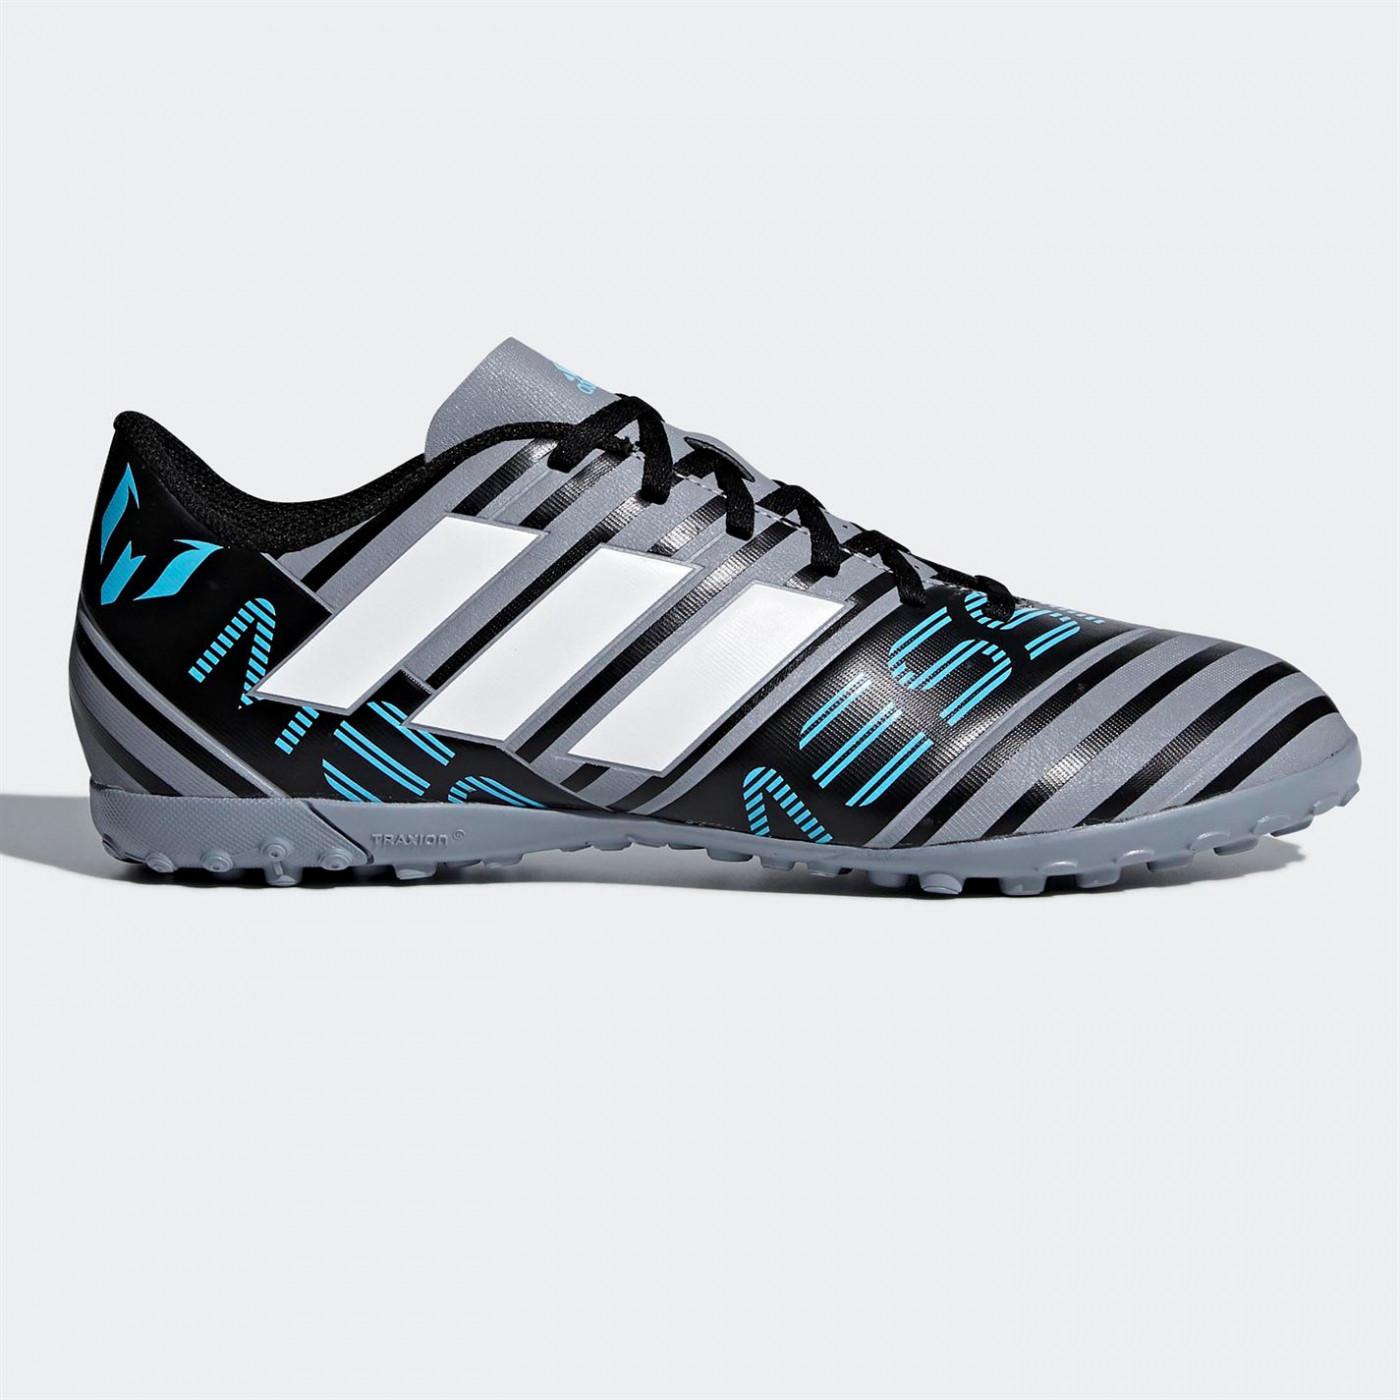 low price sale reasonably priced new lifestyle Adidas Nemeziz Messi Tango 17.4 Mens Astro Turf Trainers